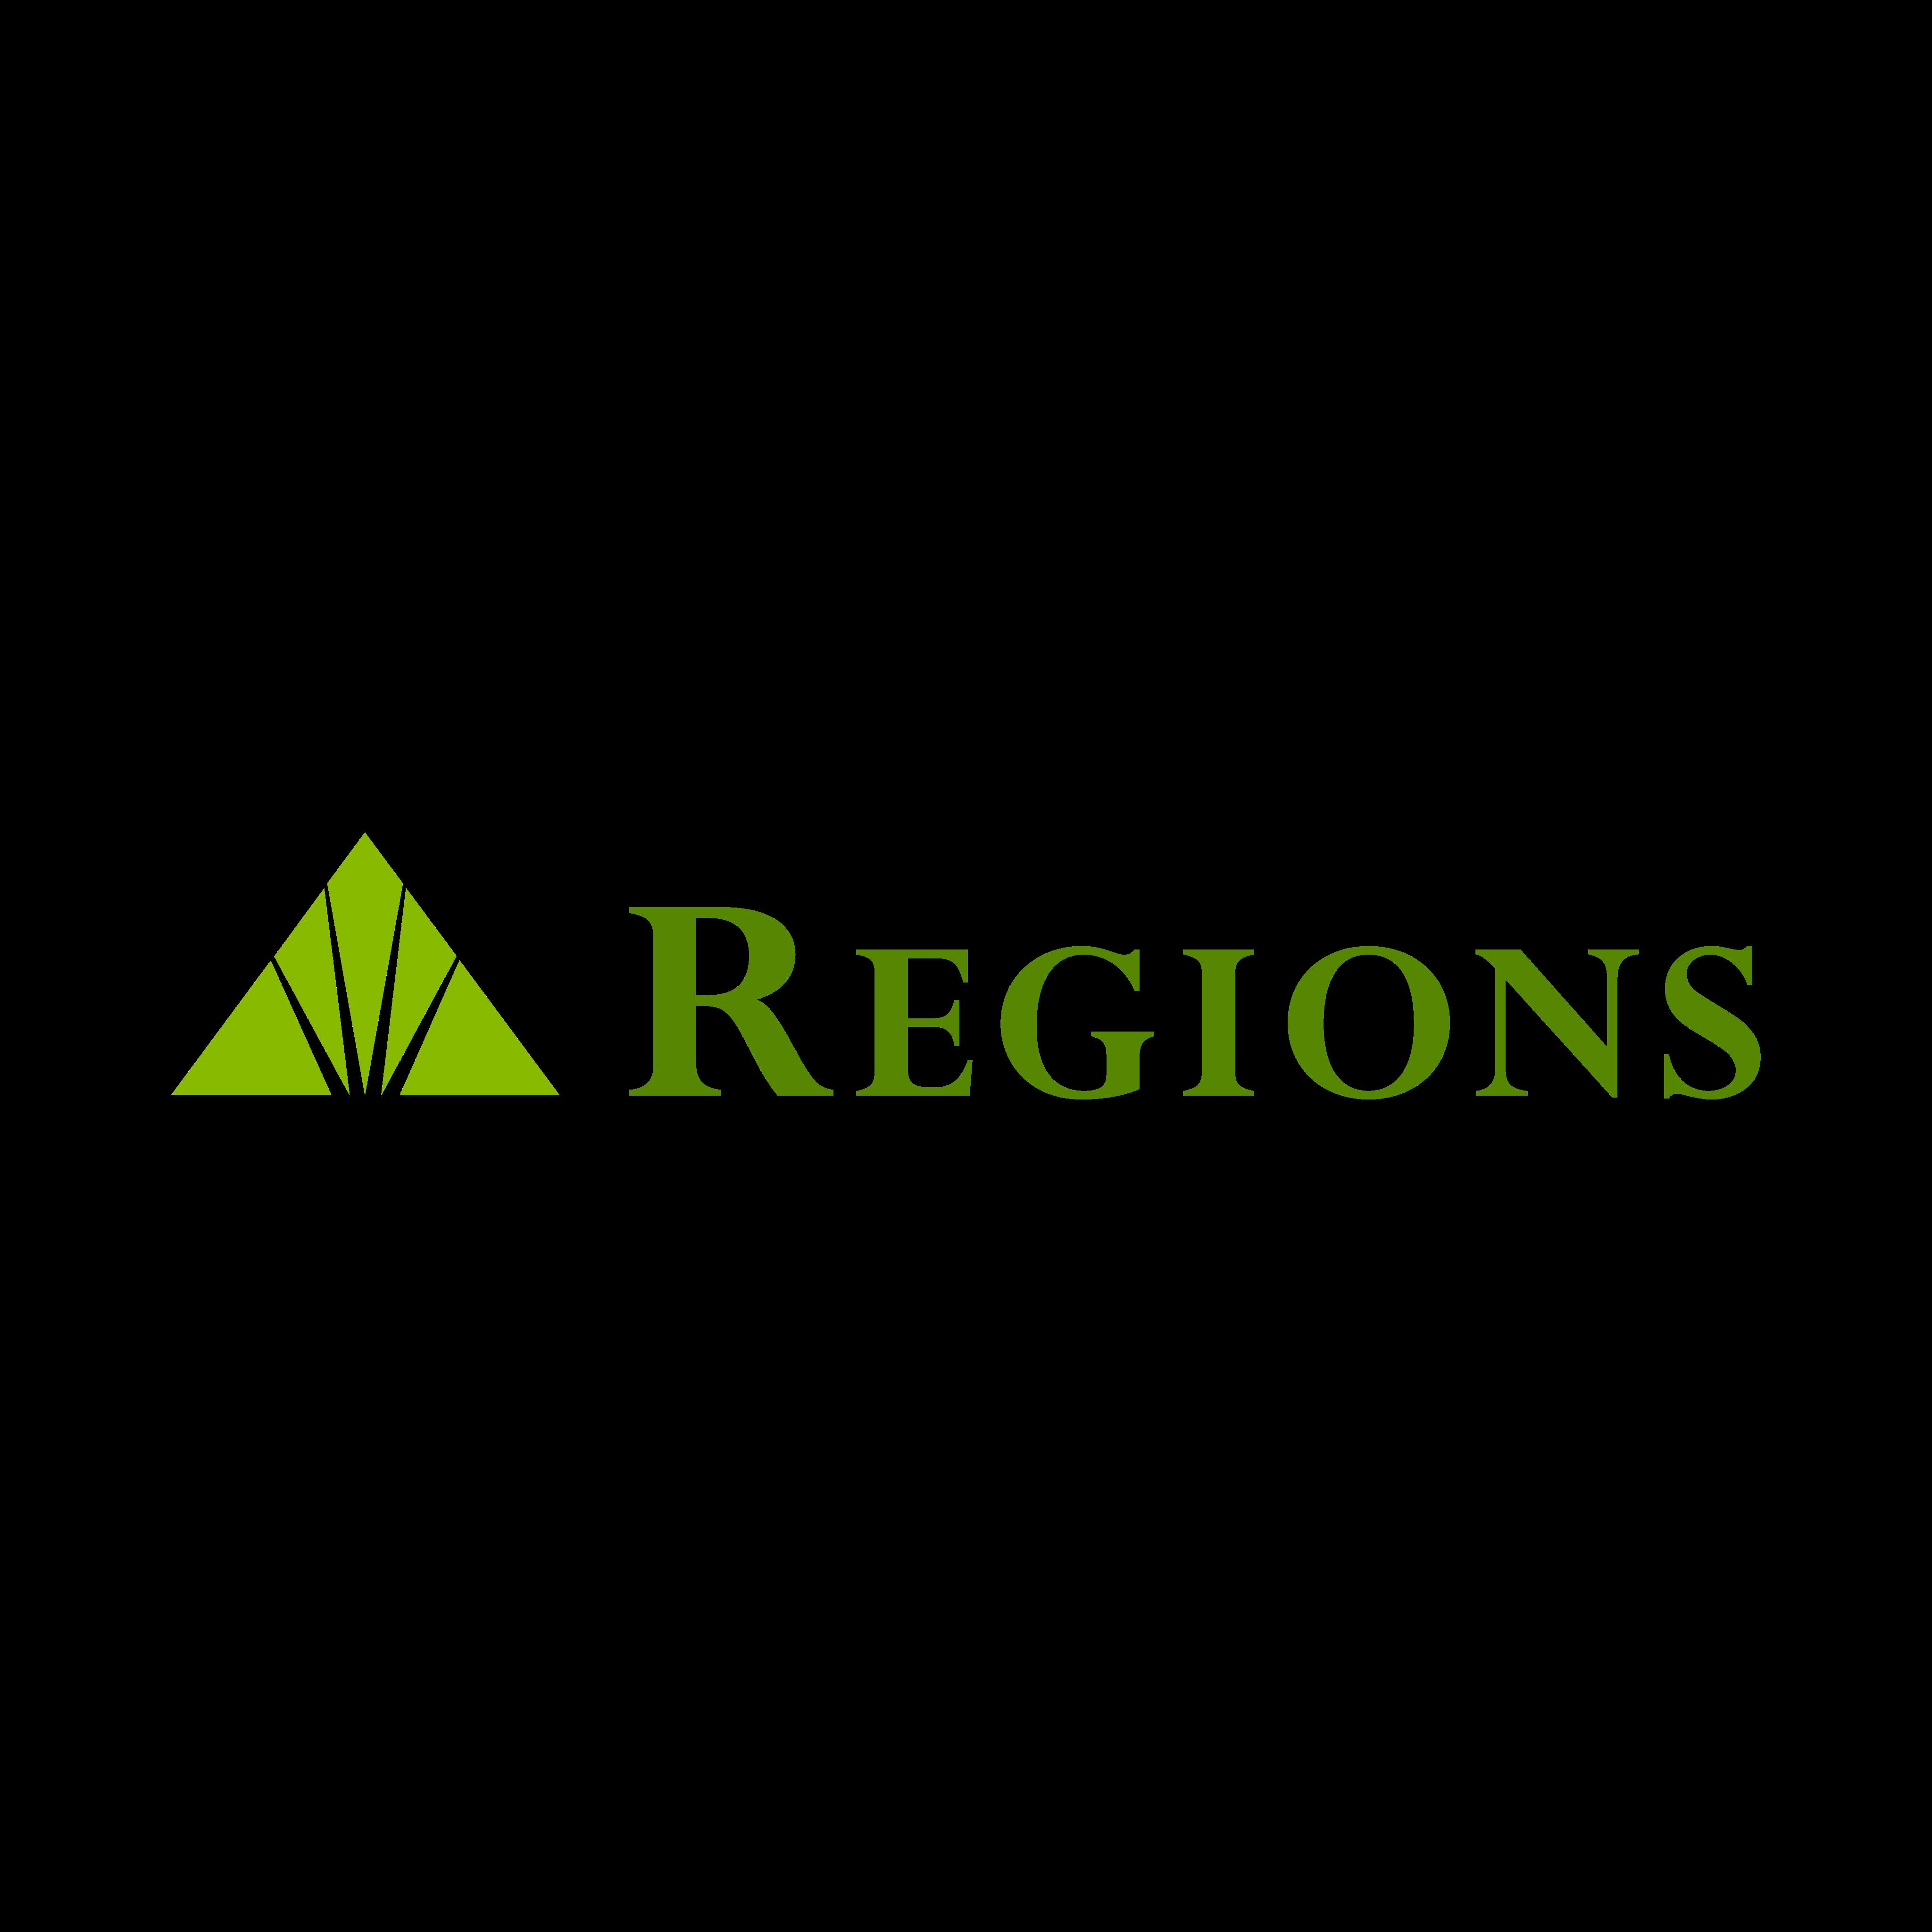 regions bank logo 0 - Regions Bank Logo